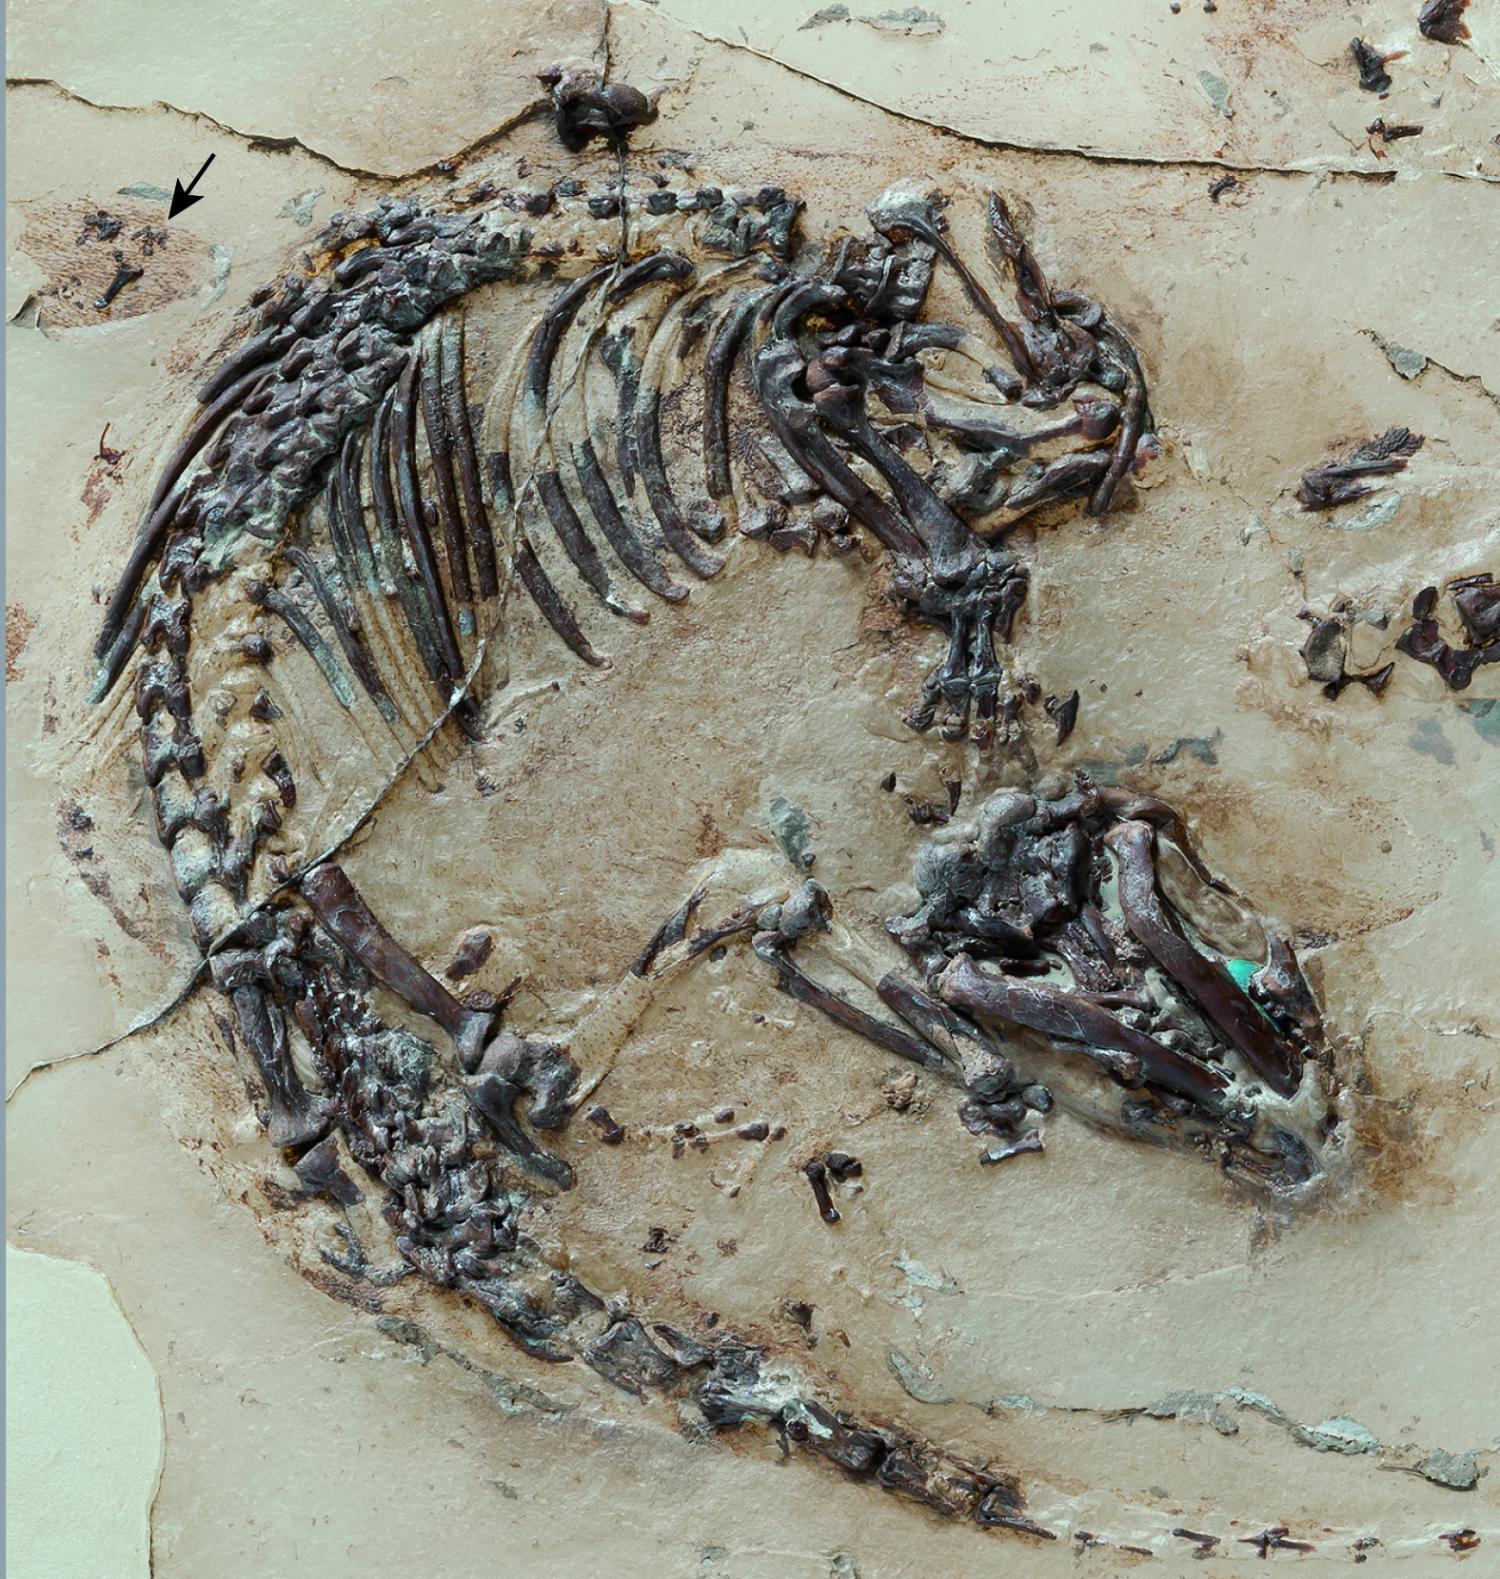 Early Mammals